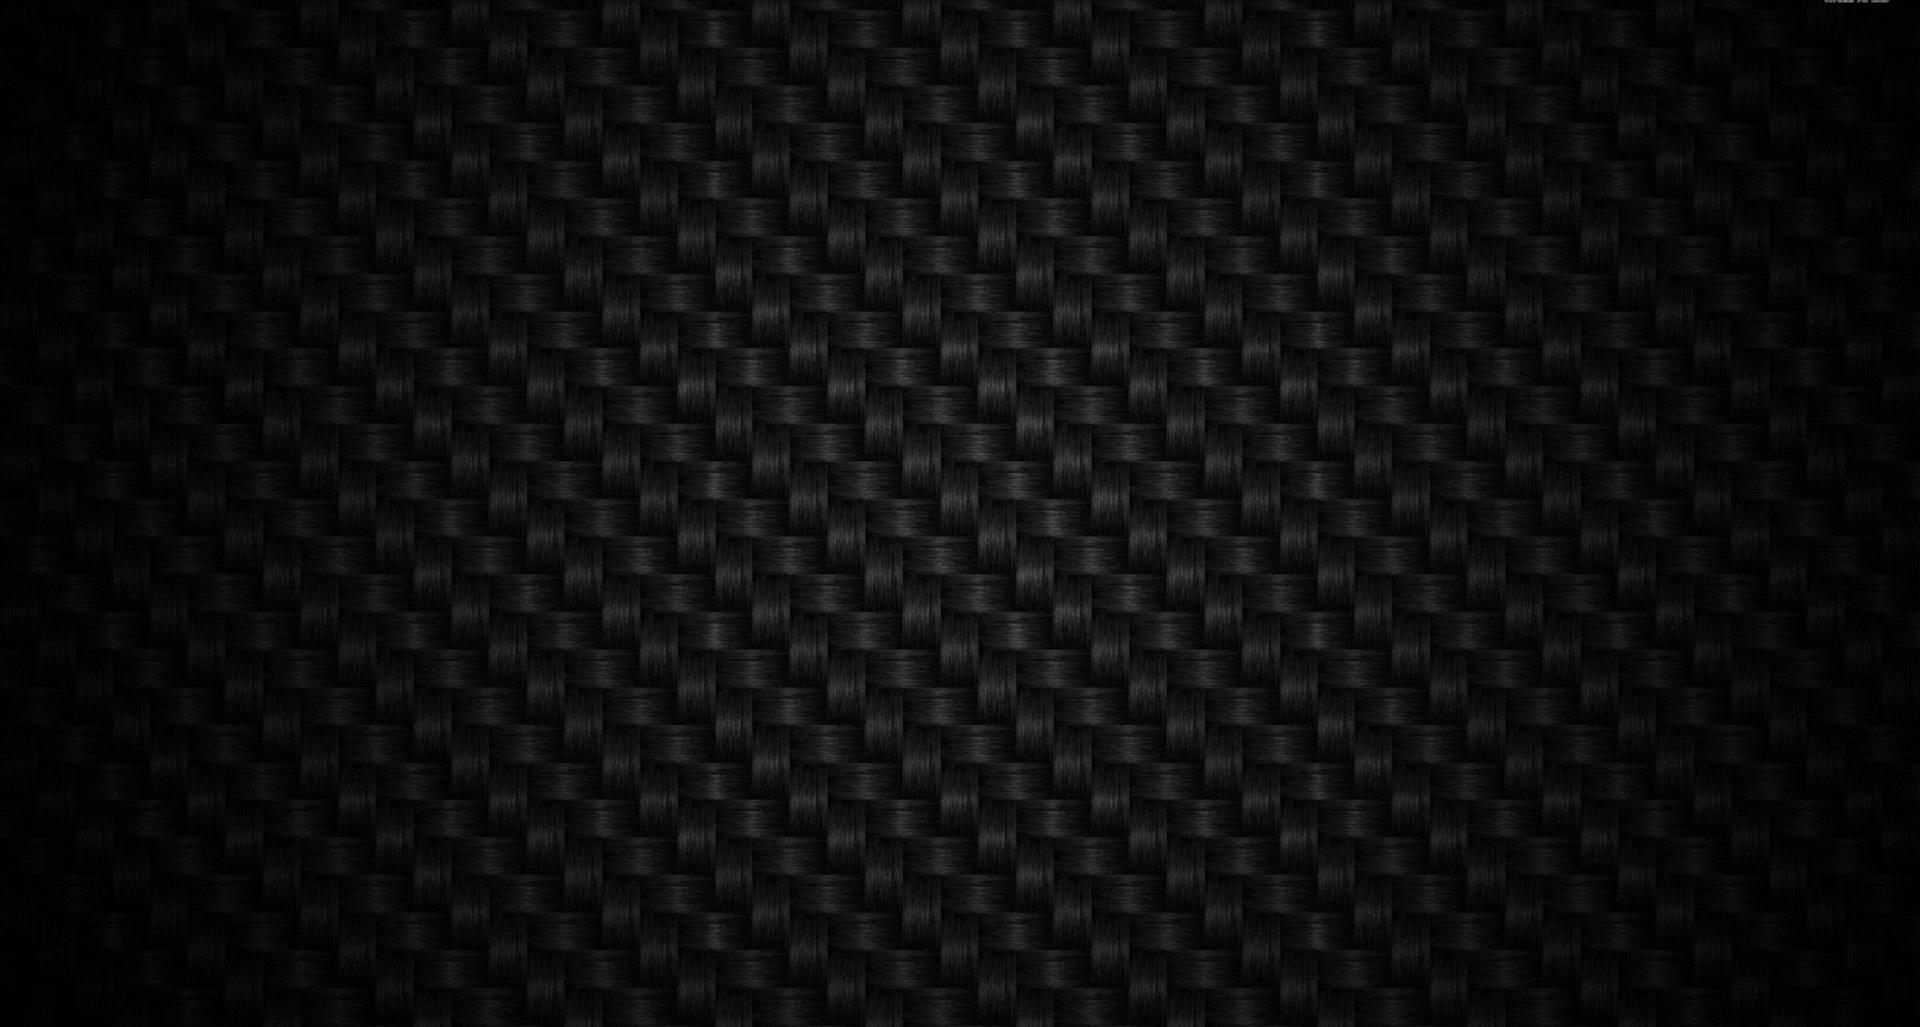 Basket weave pattern wallpapers HD quality